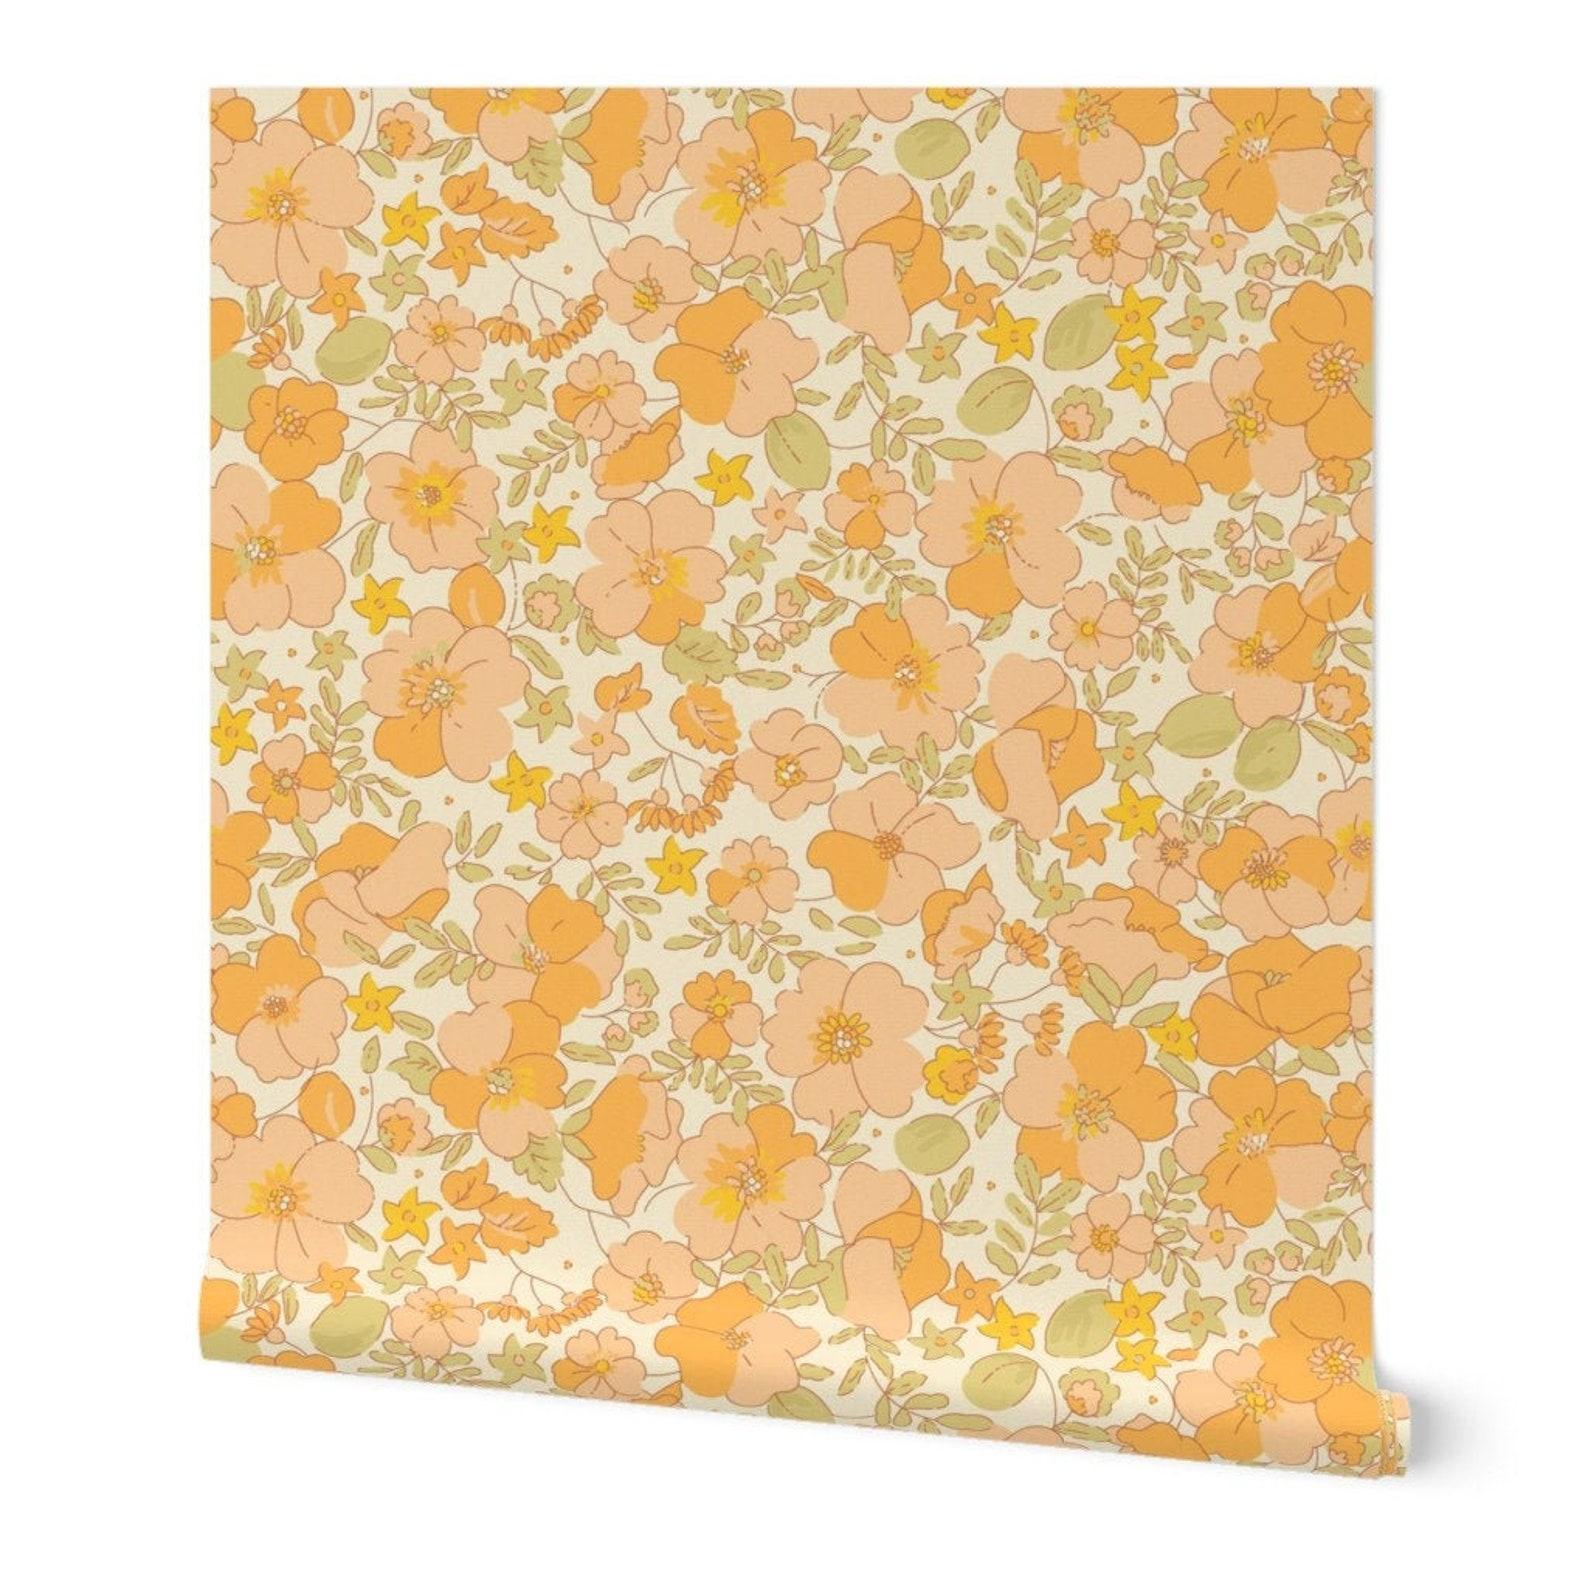 Floral Adhesive Wallpaper